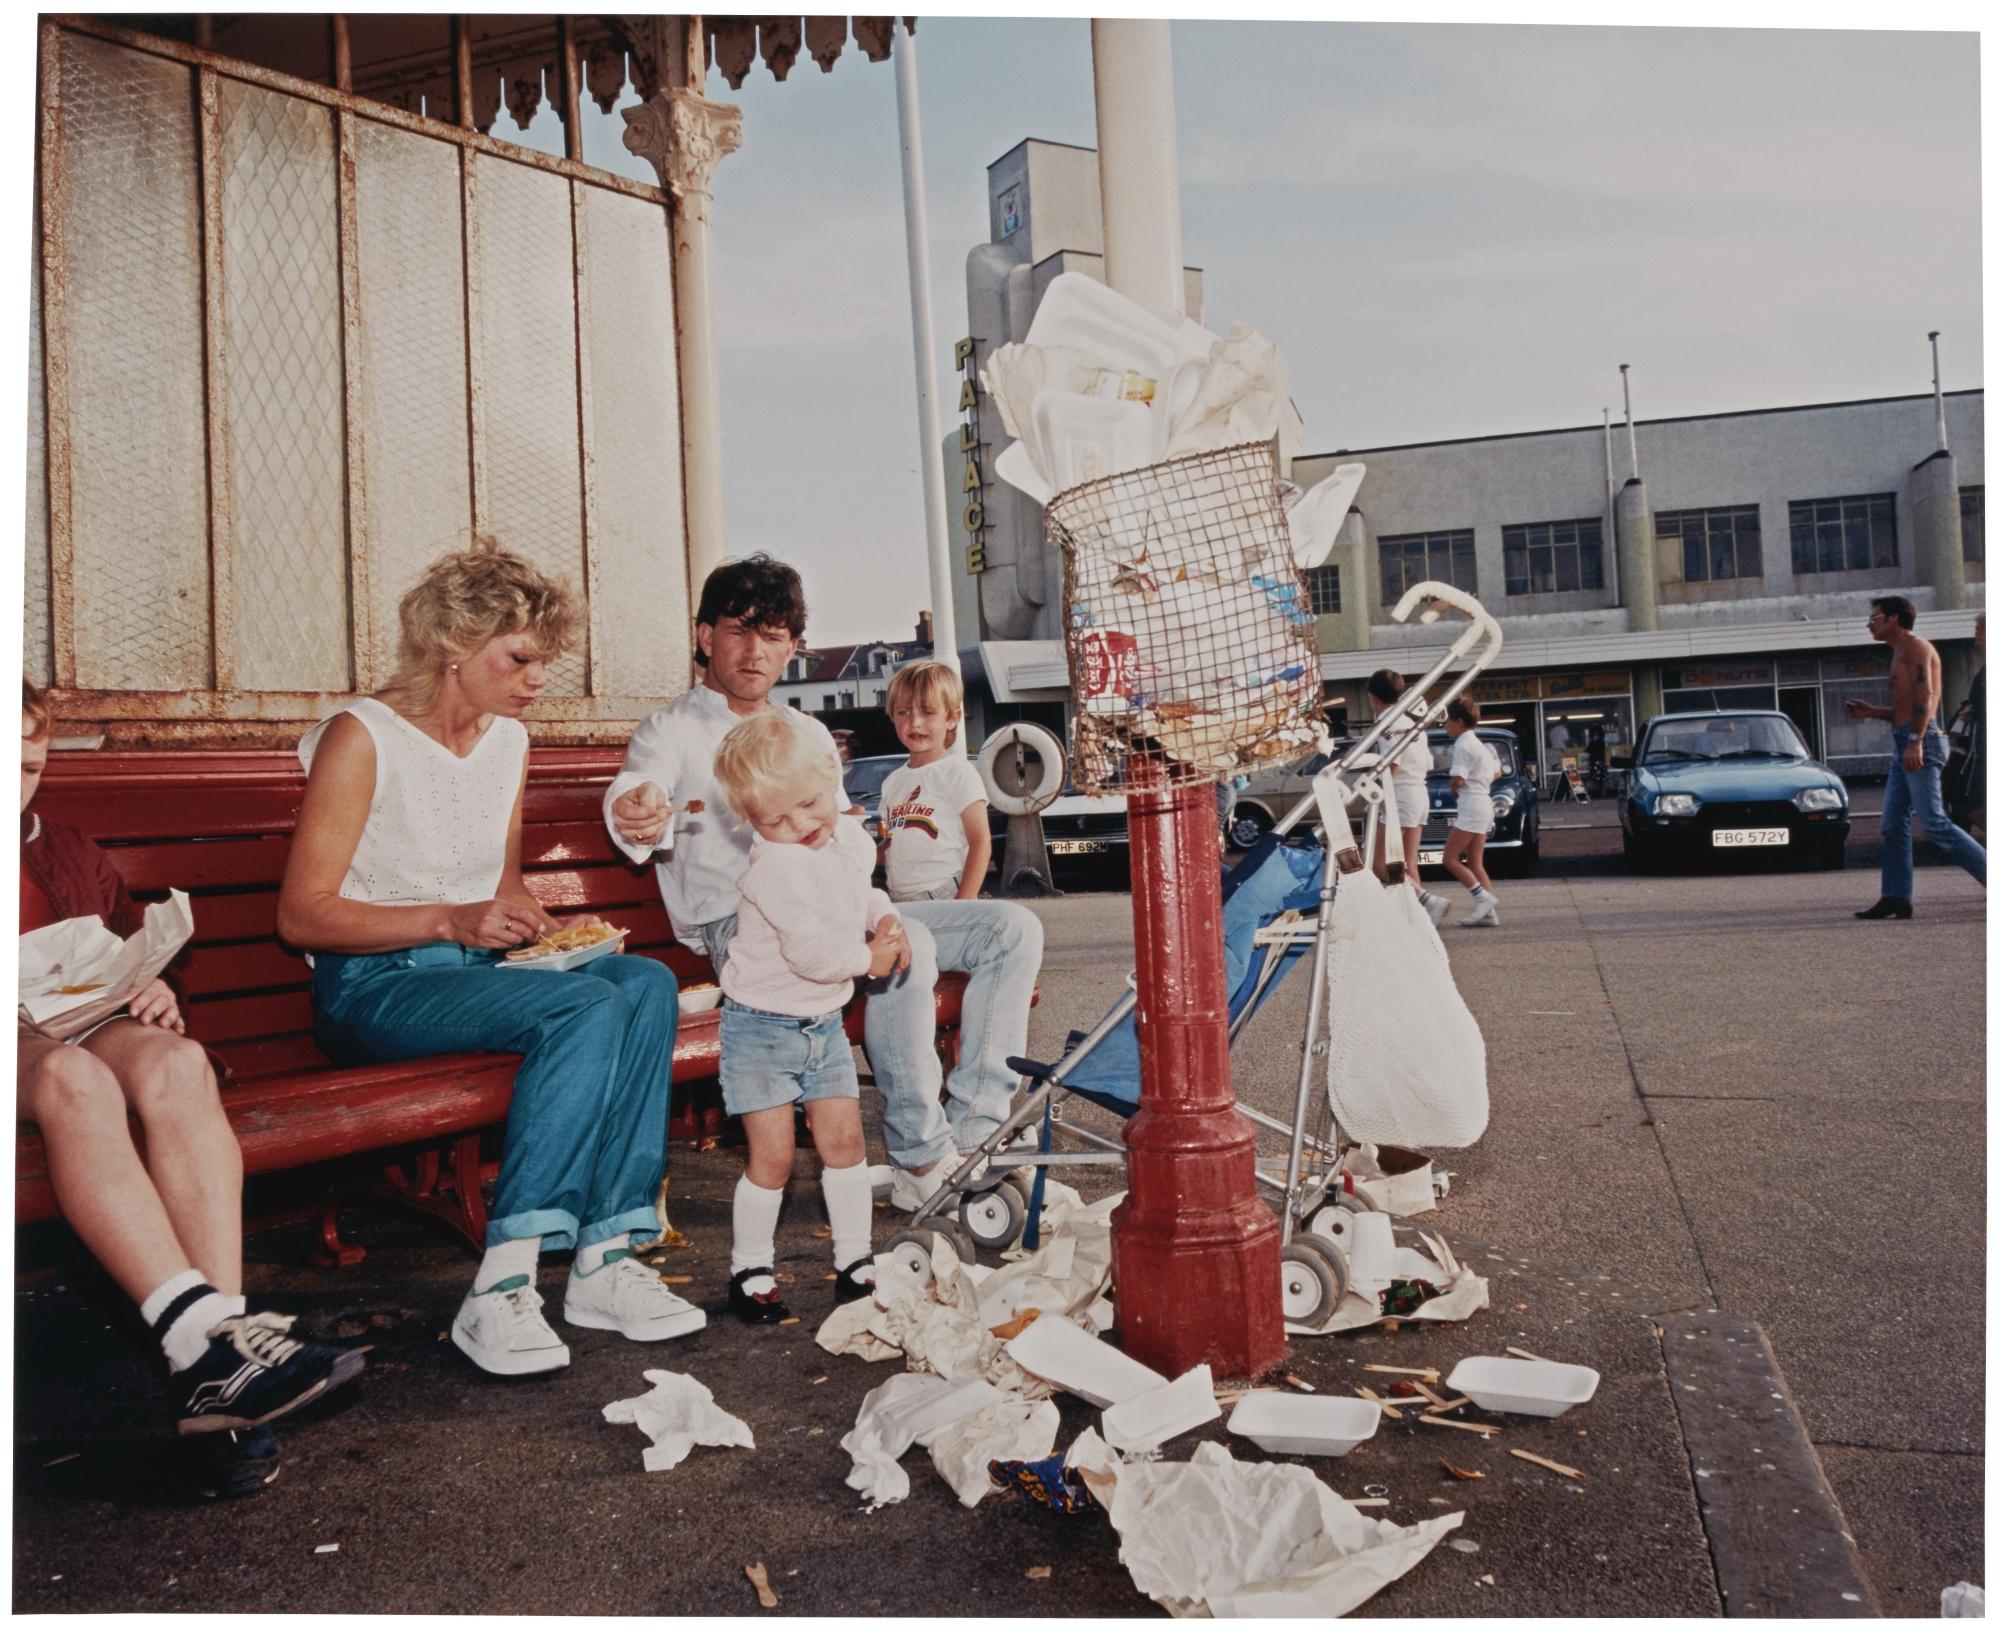 Martin Parr-New Brighton, From The Last Resort, 1983-1986-1986